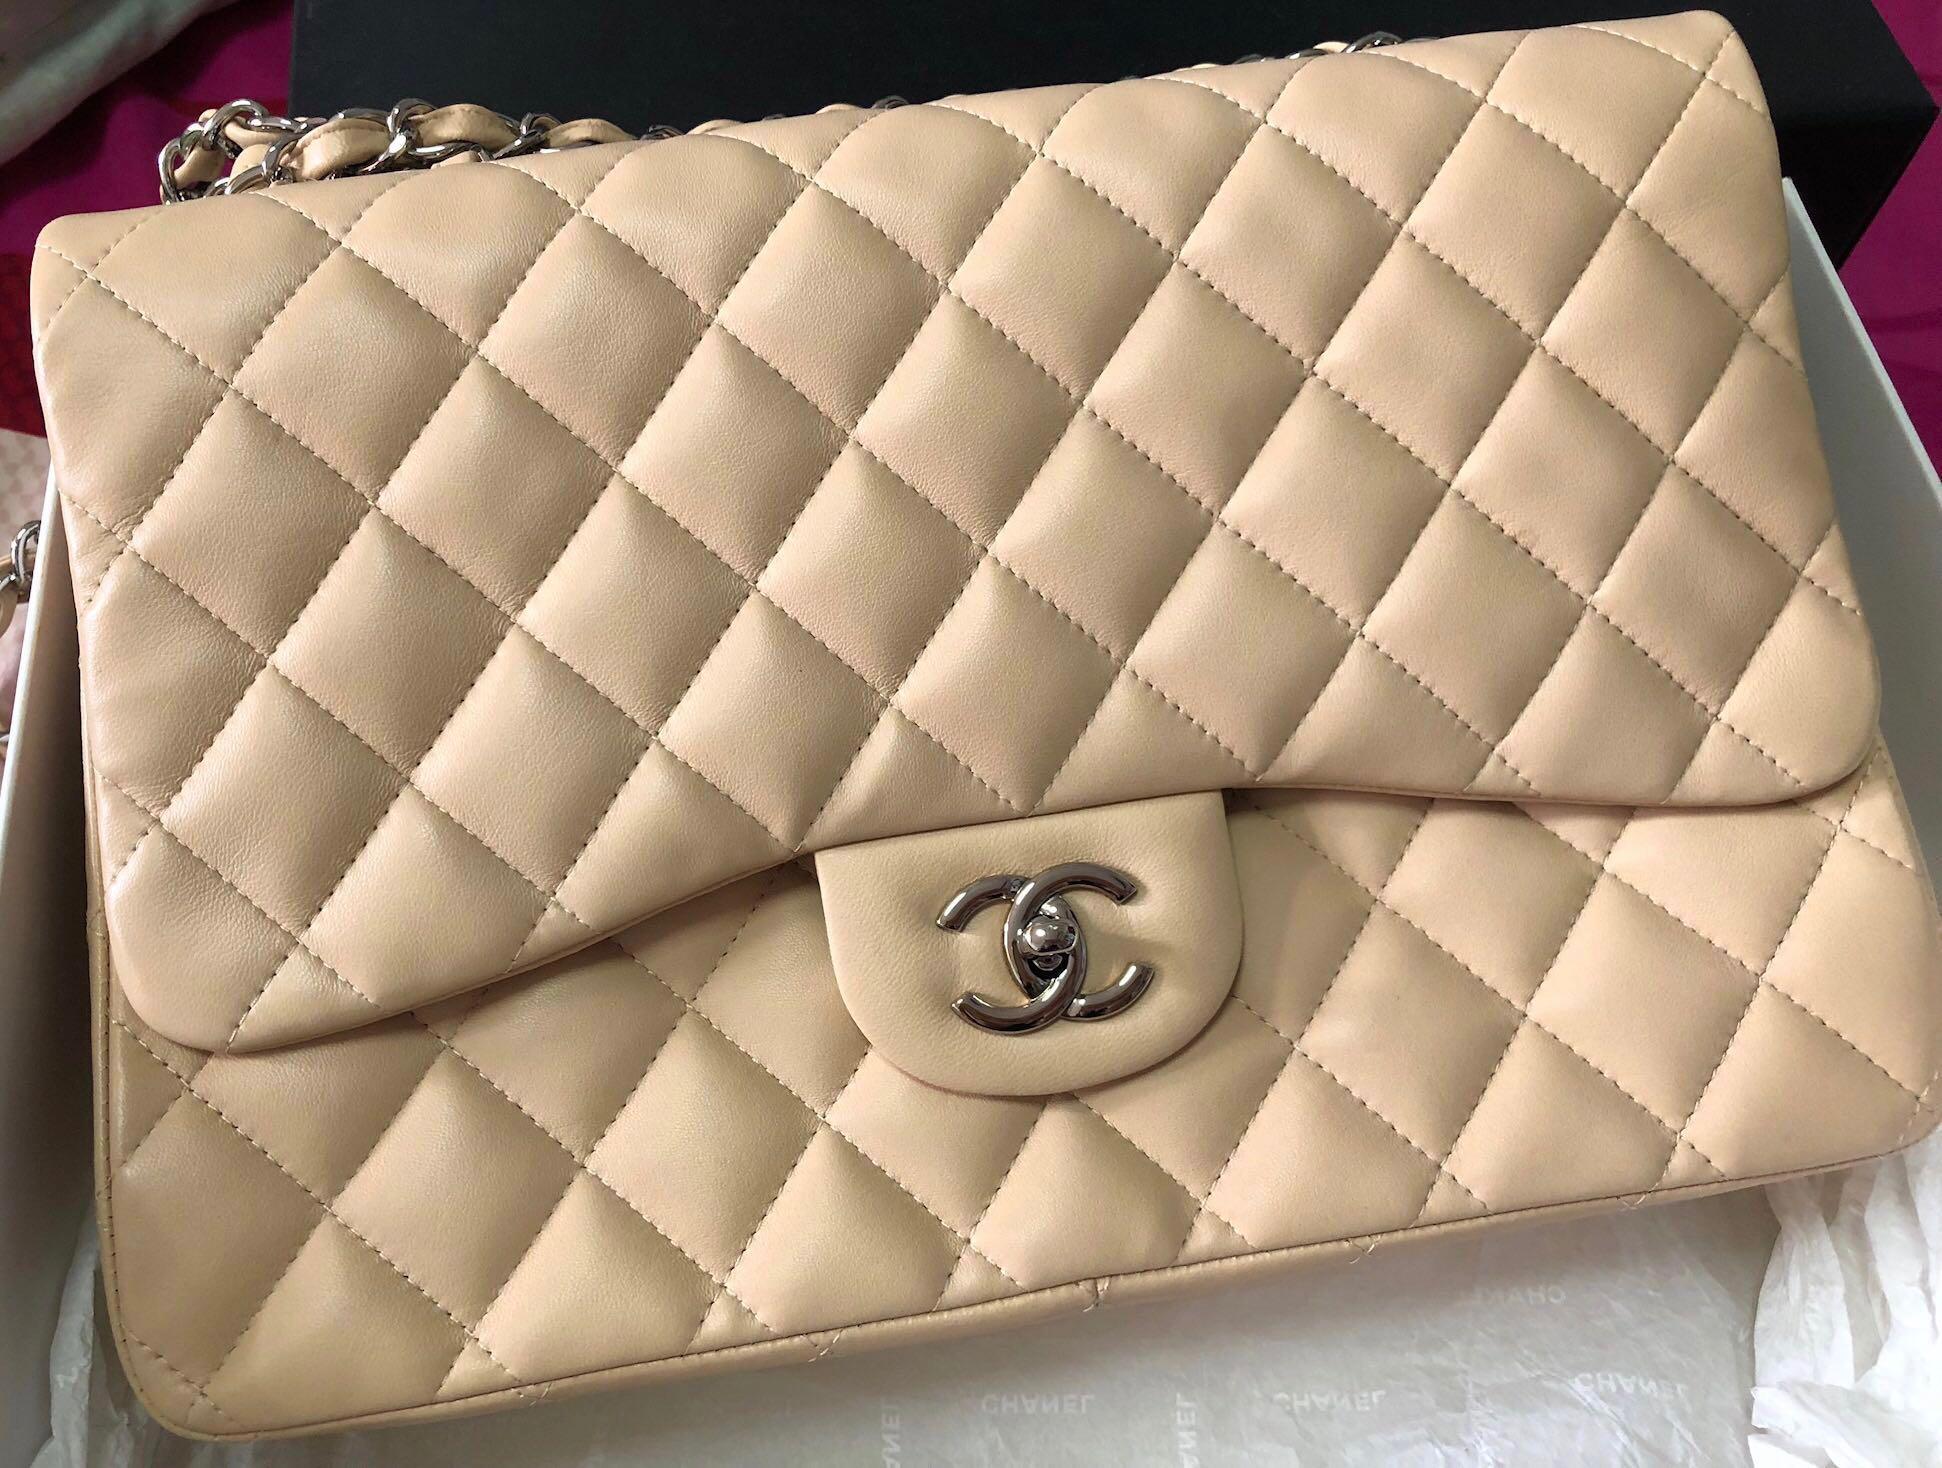 3b3aa6c5ce41 Authentic Chanel Classic Jumbo Flap Bag Lambskin in Beige (SHW), Luxury,  Bags & Wallets, Handbags on Carousell